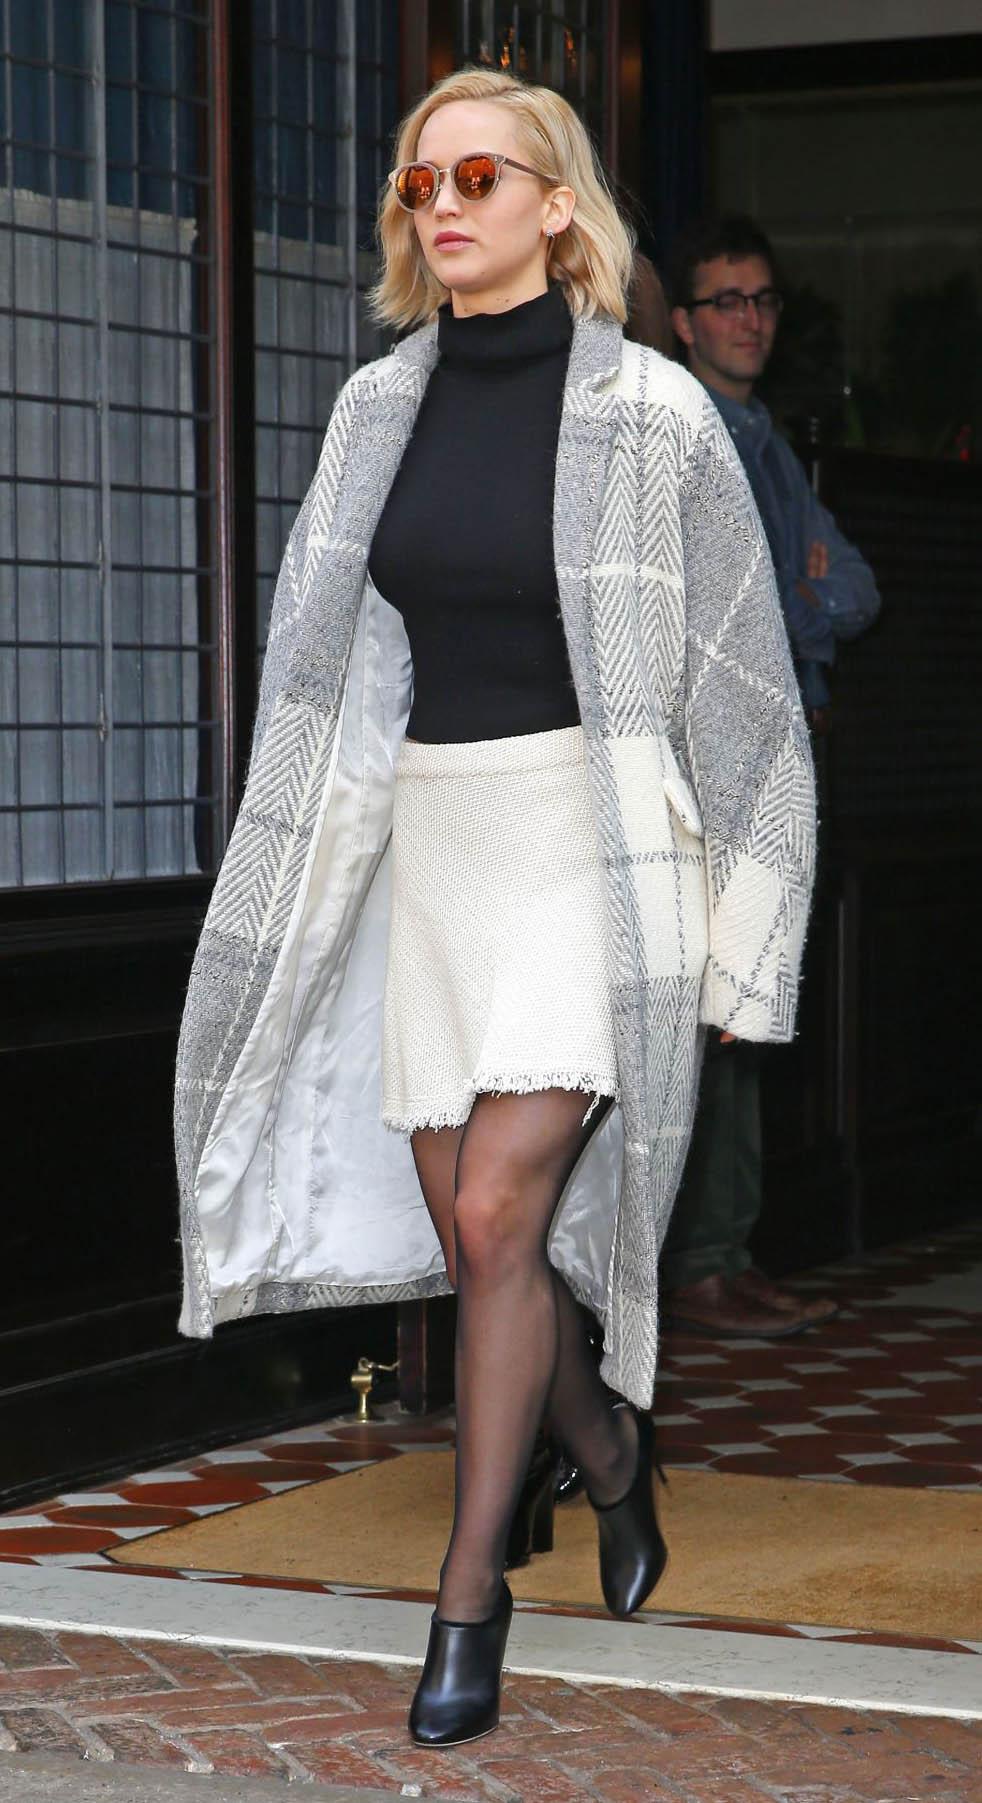 white-mini-skirt-black-sweater-turtleneck-black-tights-black-shoe-booties-grayl-jacket-coatigan-plaid-sun-jenniferlawrence-style-fall-winter-blonde-work.jpg